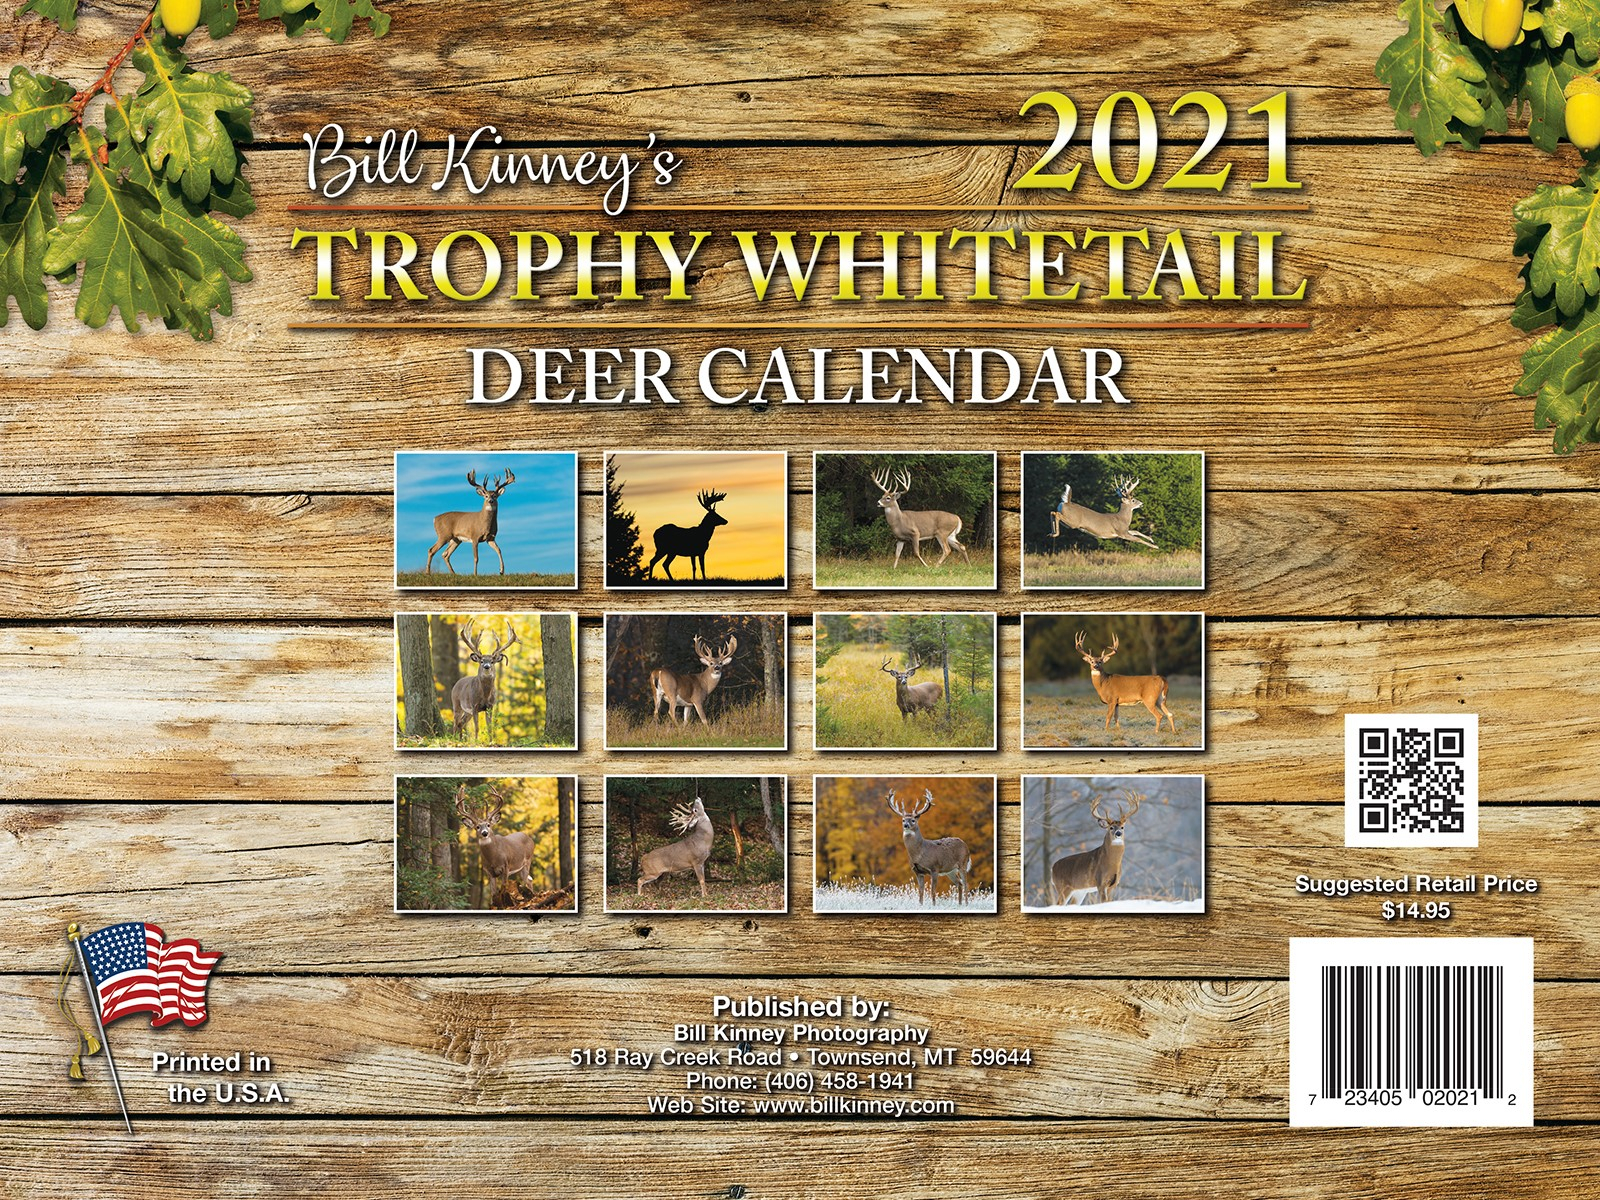 Billkinney with Whitetail Rut Calendar 2021